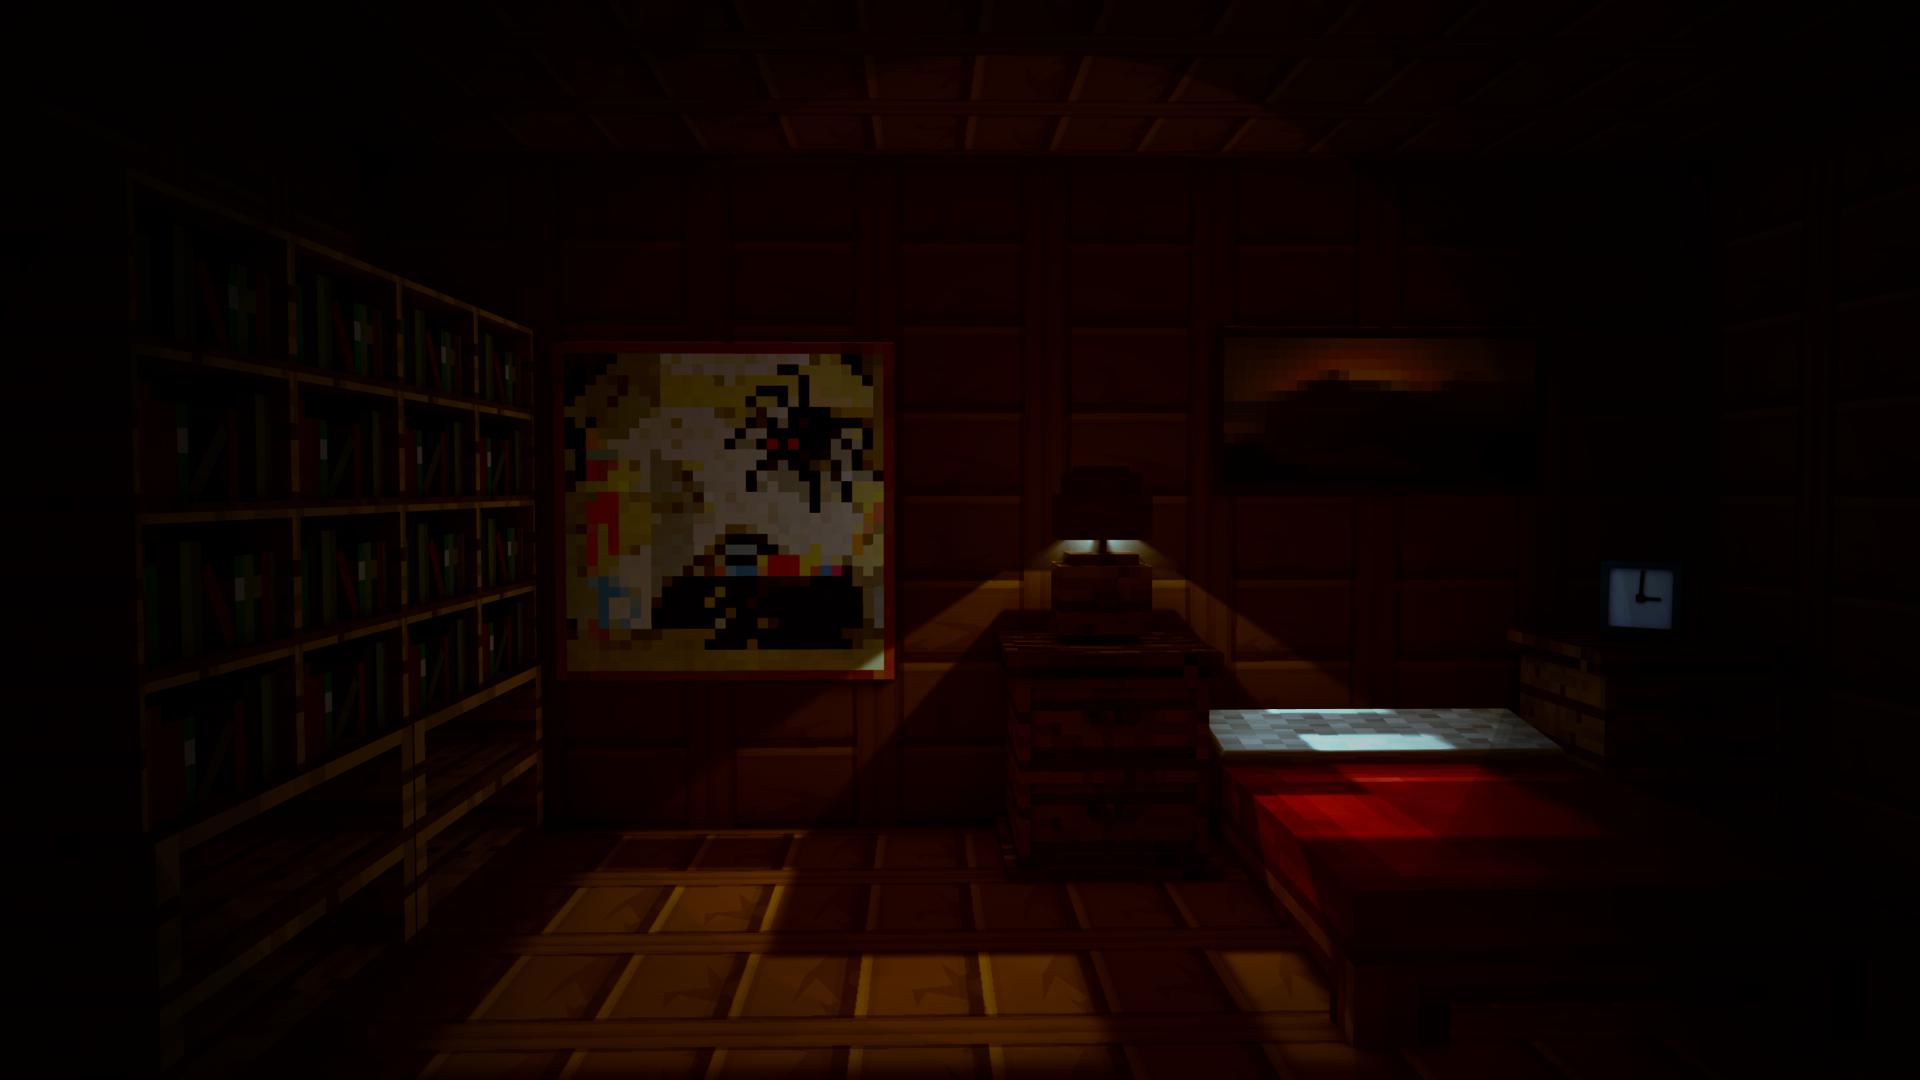 Amazing Wallpaper Minecraft Halloween - minecraft_halloween_render_by_vanillaplays-d82let1  2018_439783.png